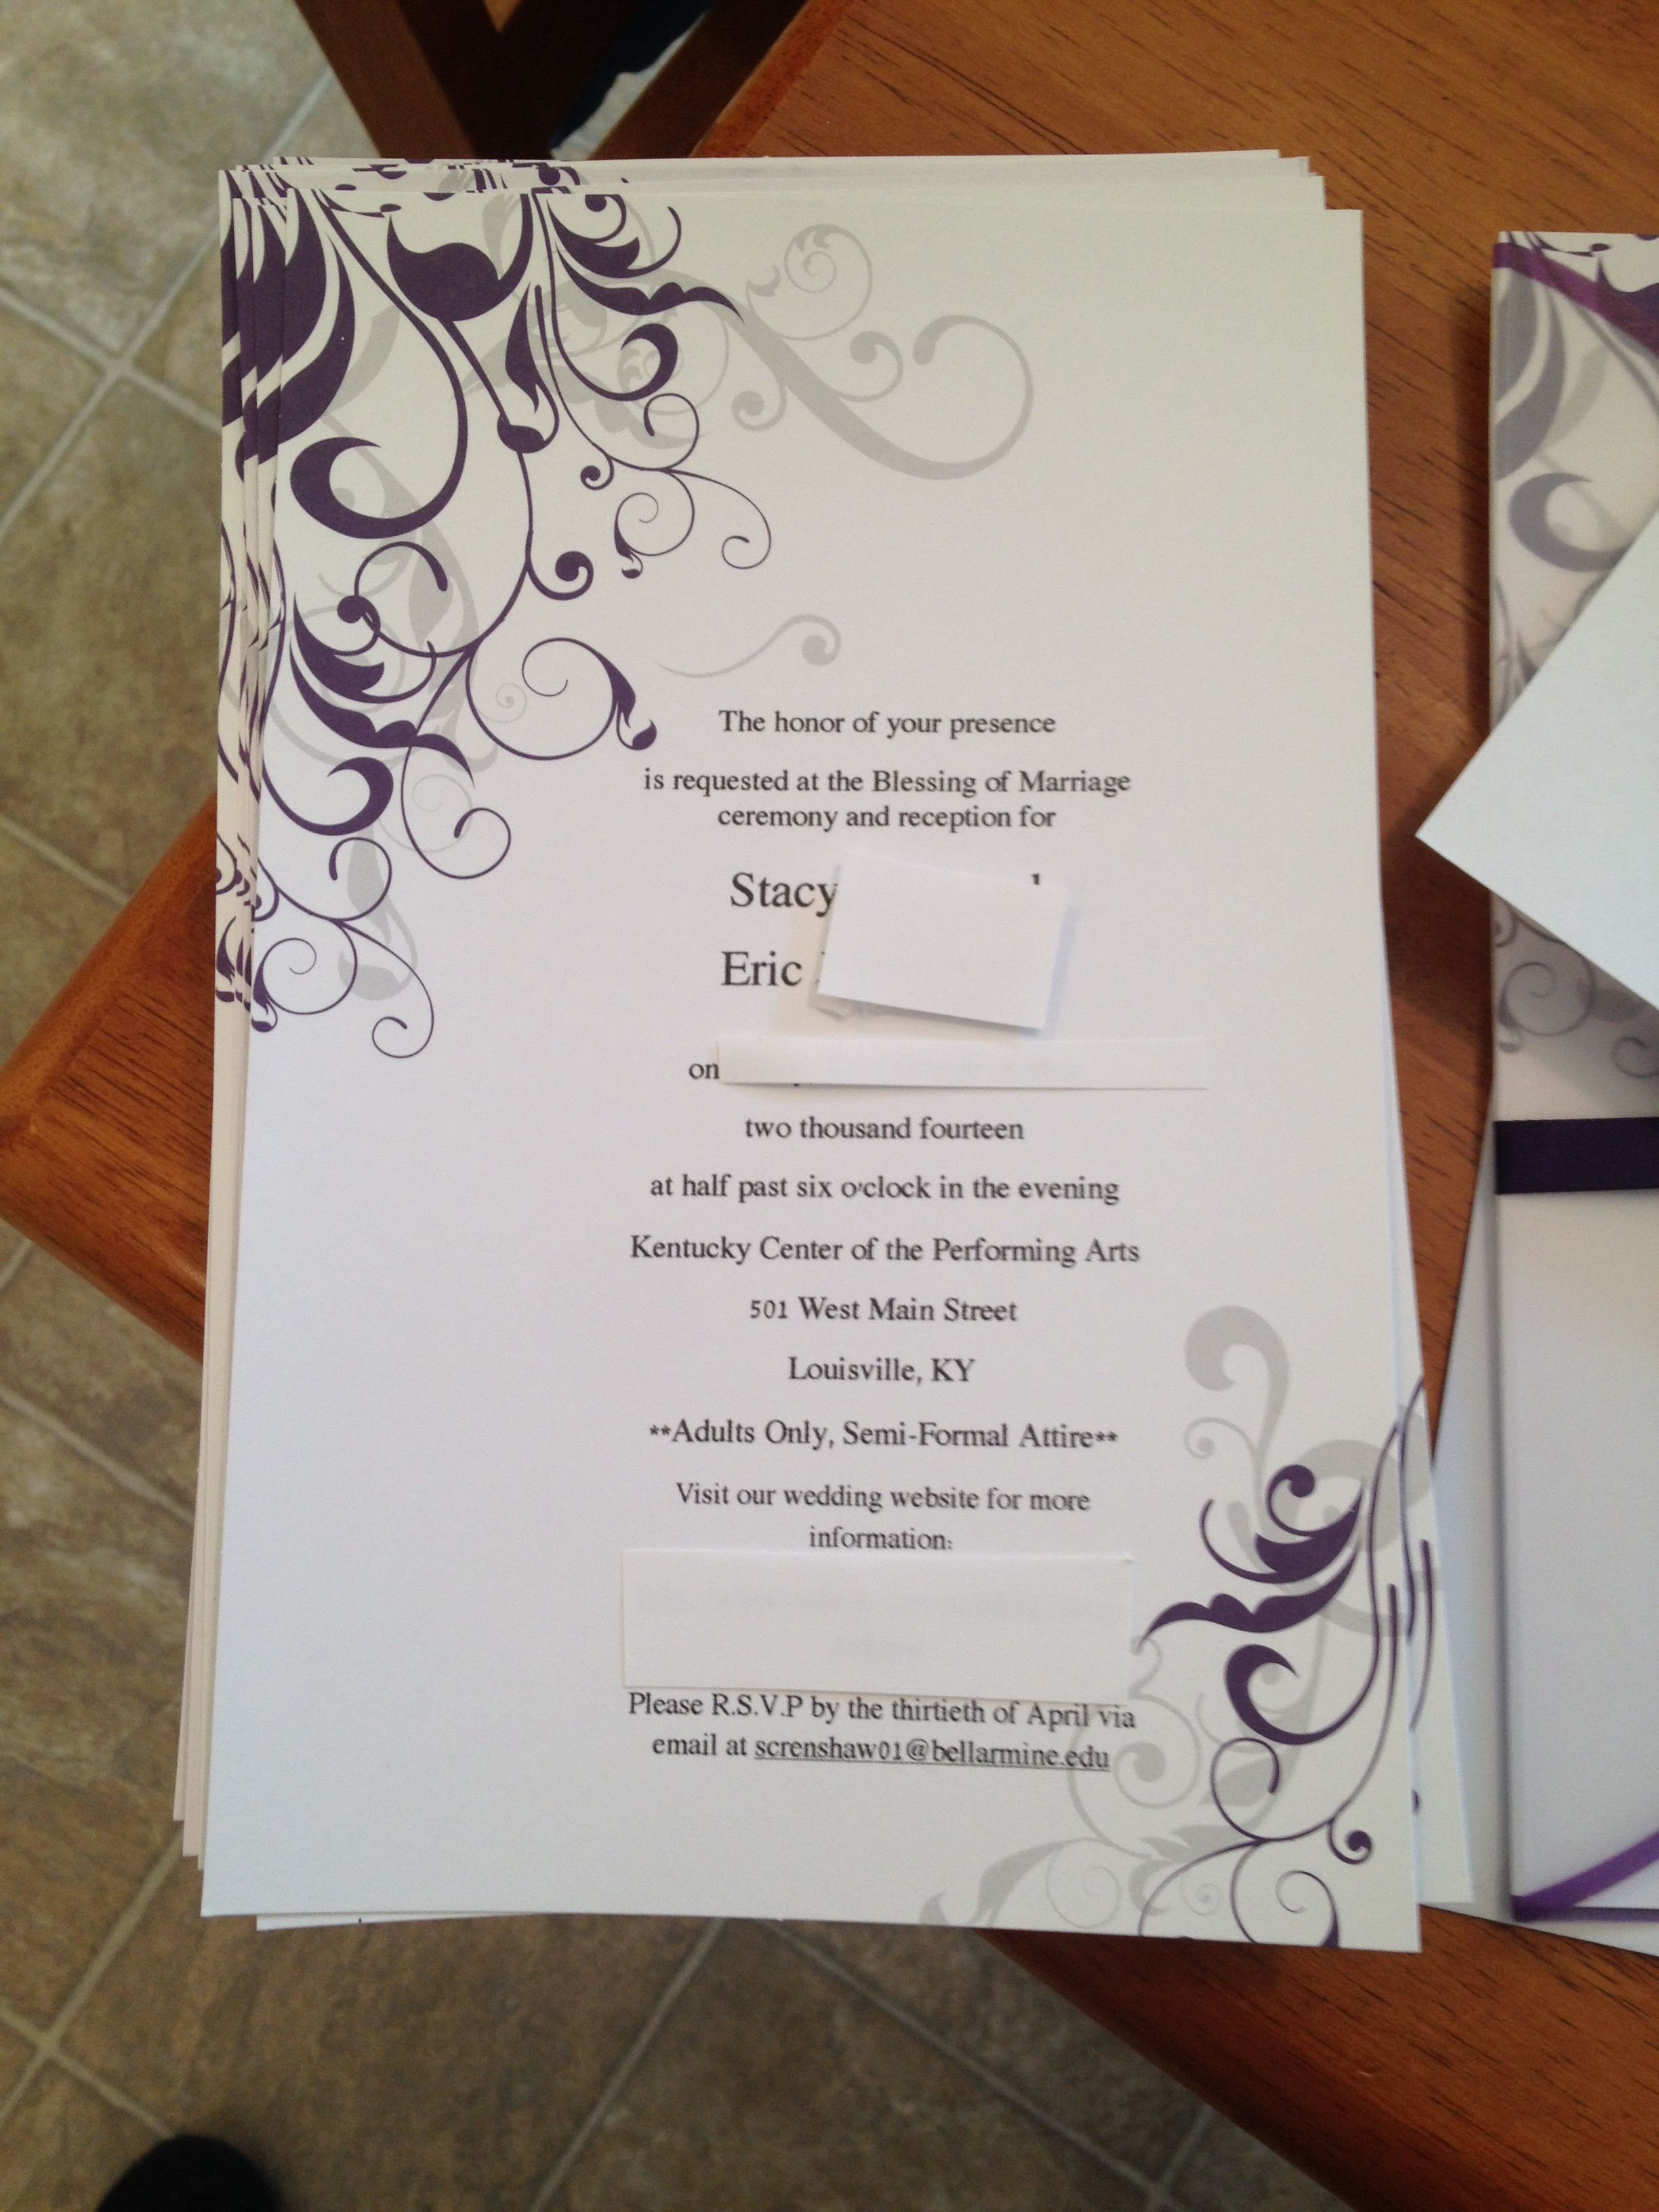 Wedding Shower Invitations At Target Design 2019 Make Wedding Invitations In 2020 Hobby Lobby Wedding Invitations Wedding Invitation Packages Wedding Invitation Kits